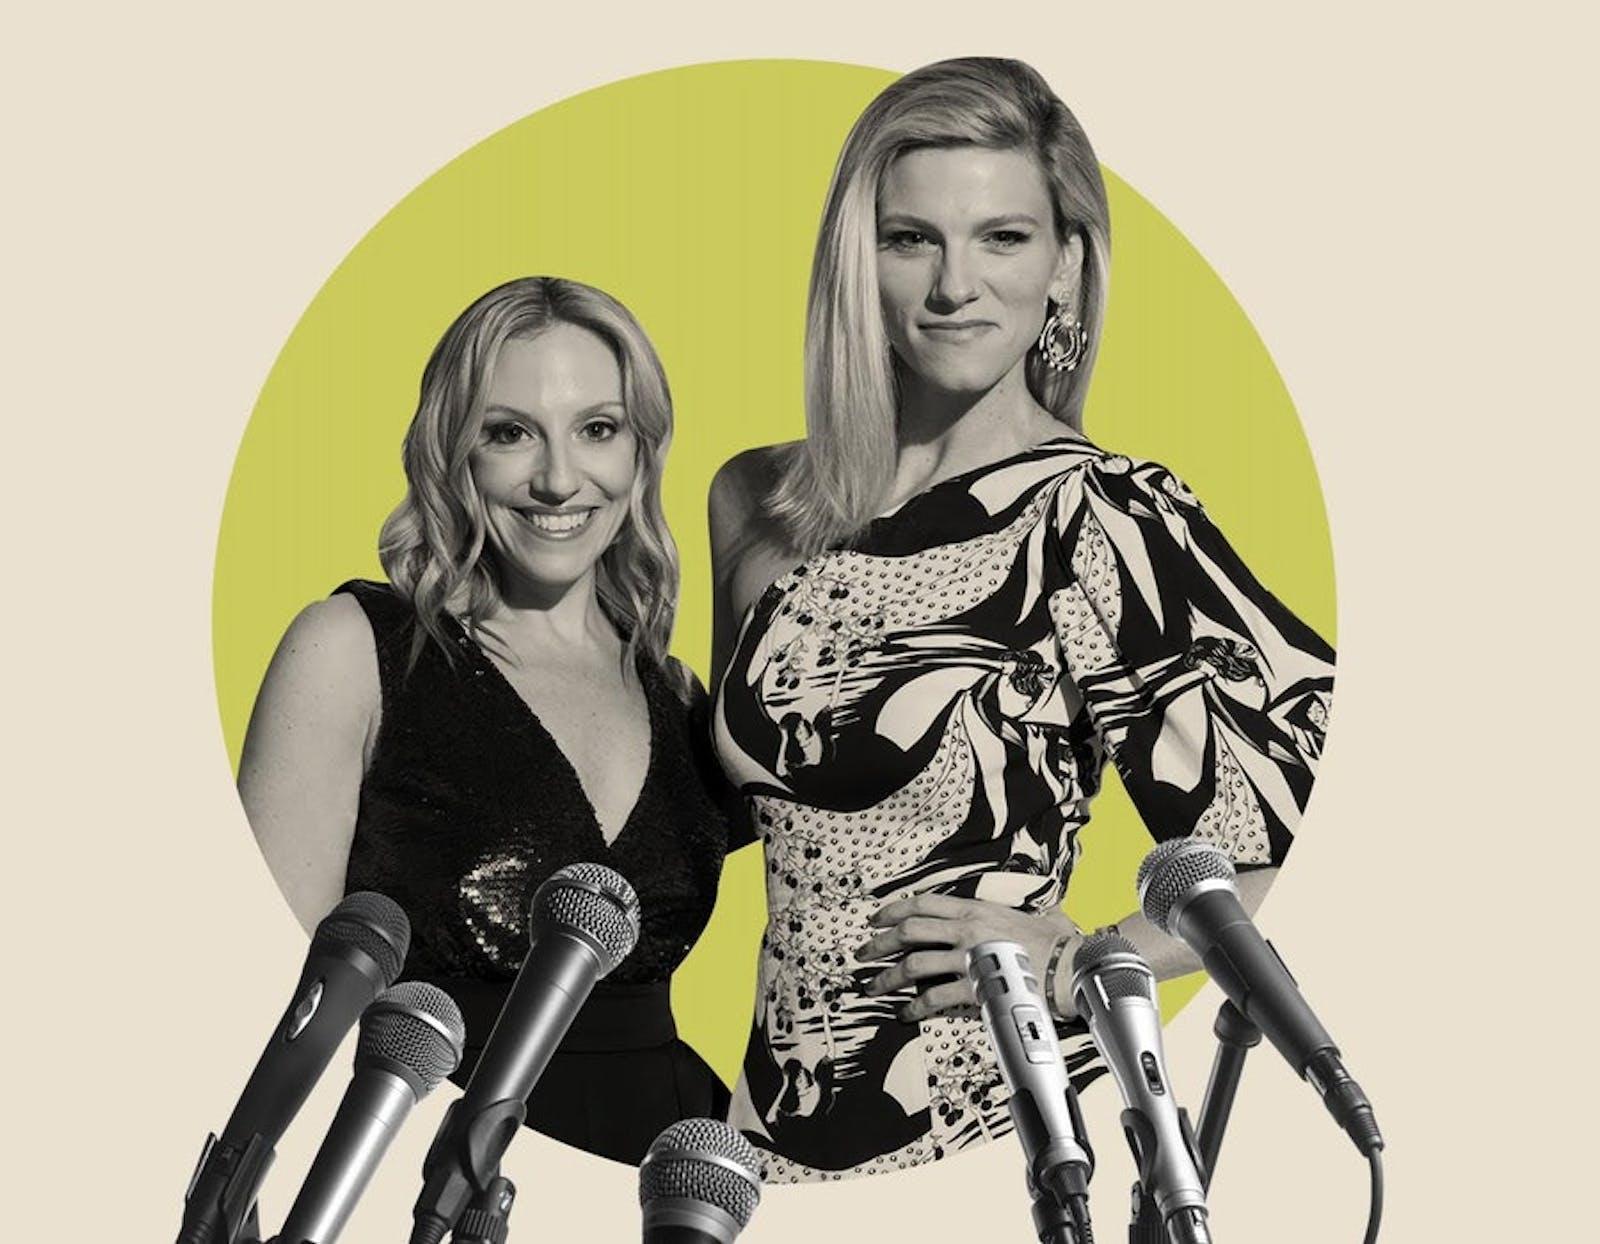 Bustle Piece: For Lindsay Shookus & Kristin O'Keeffe Merrick, It's Real Talk Or Bust